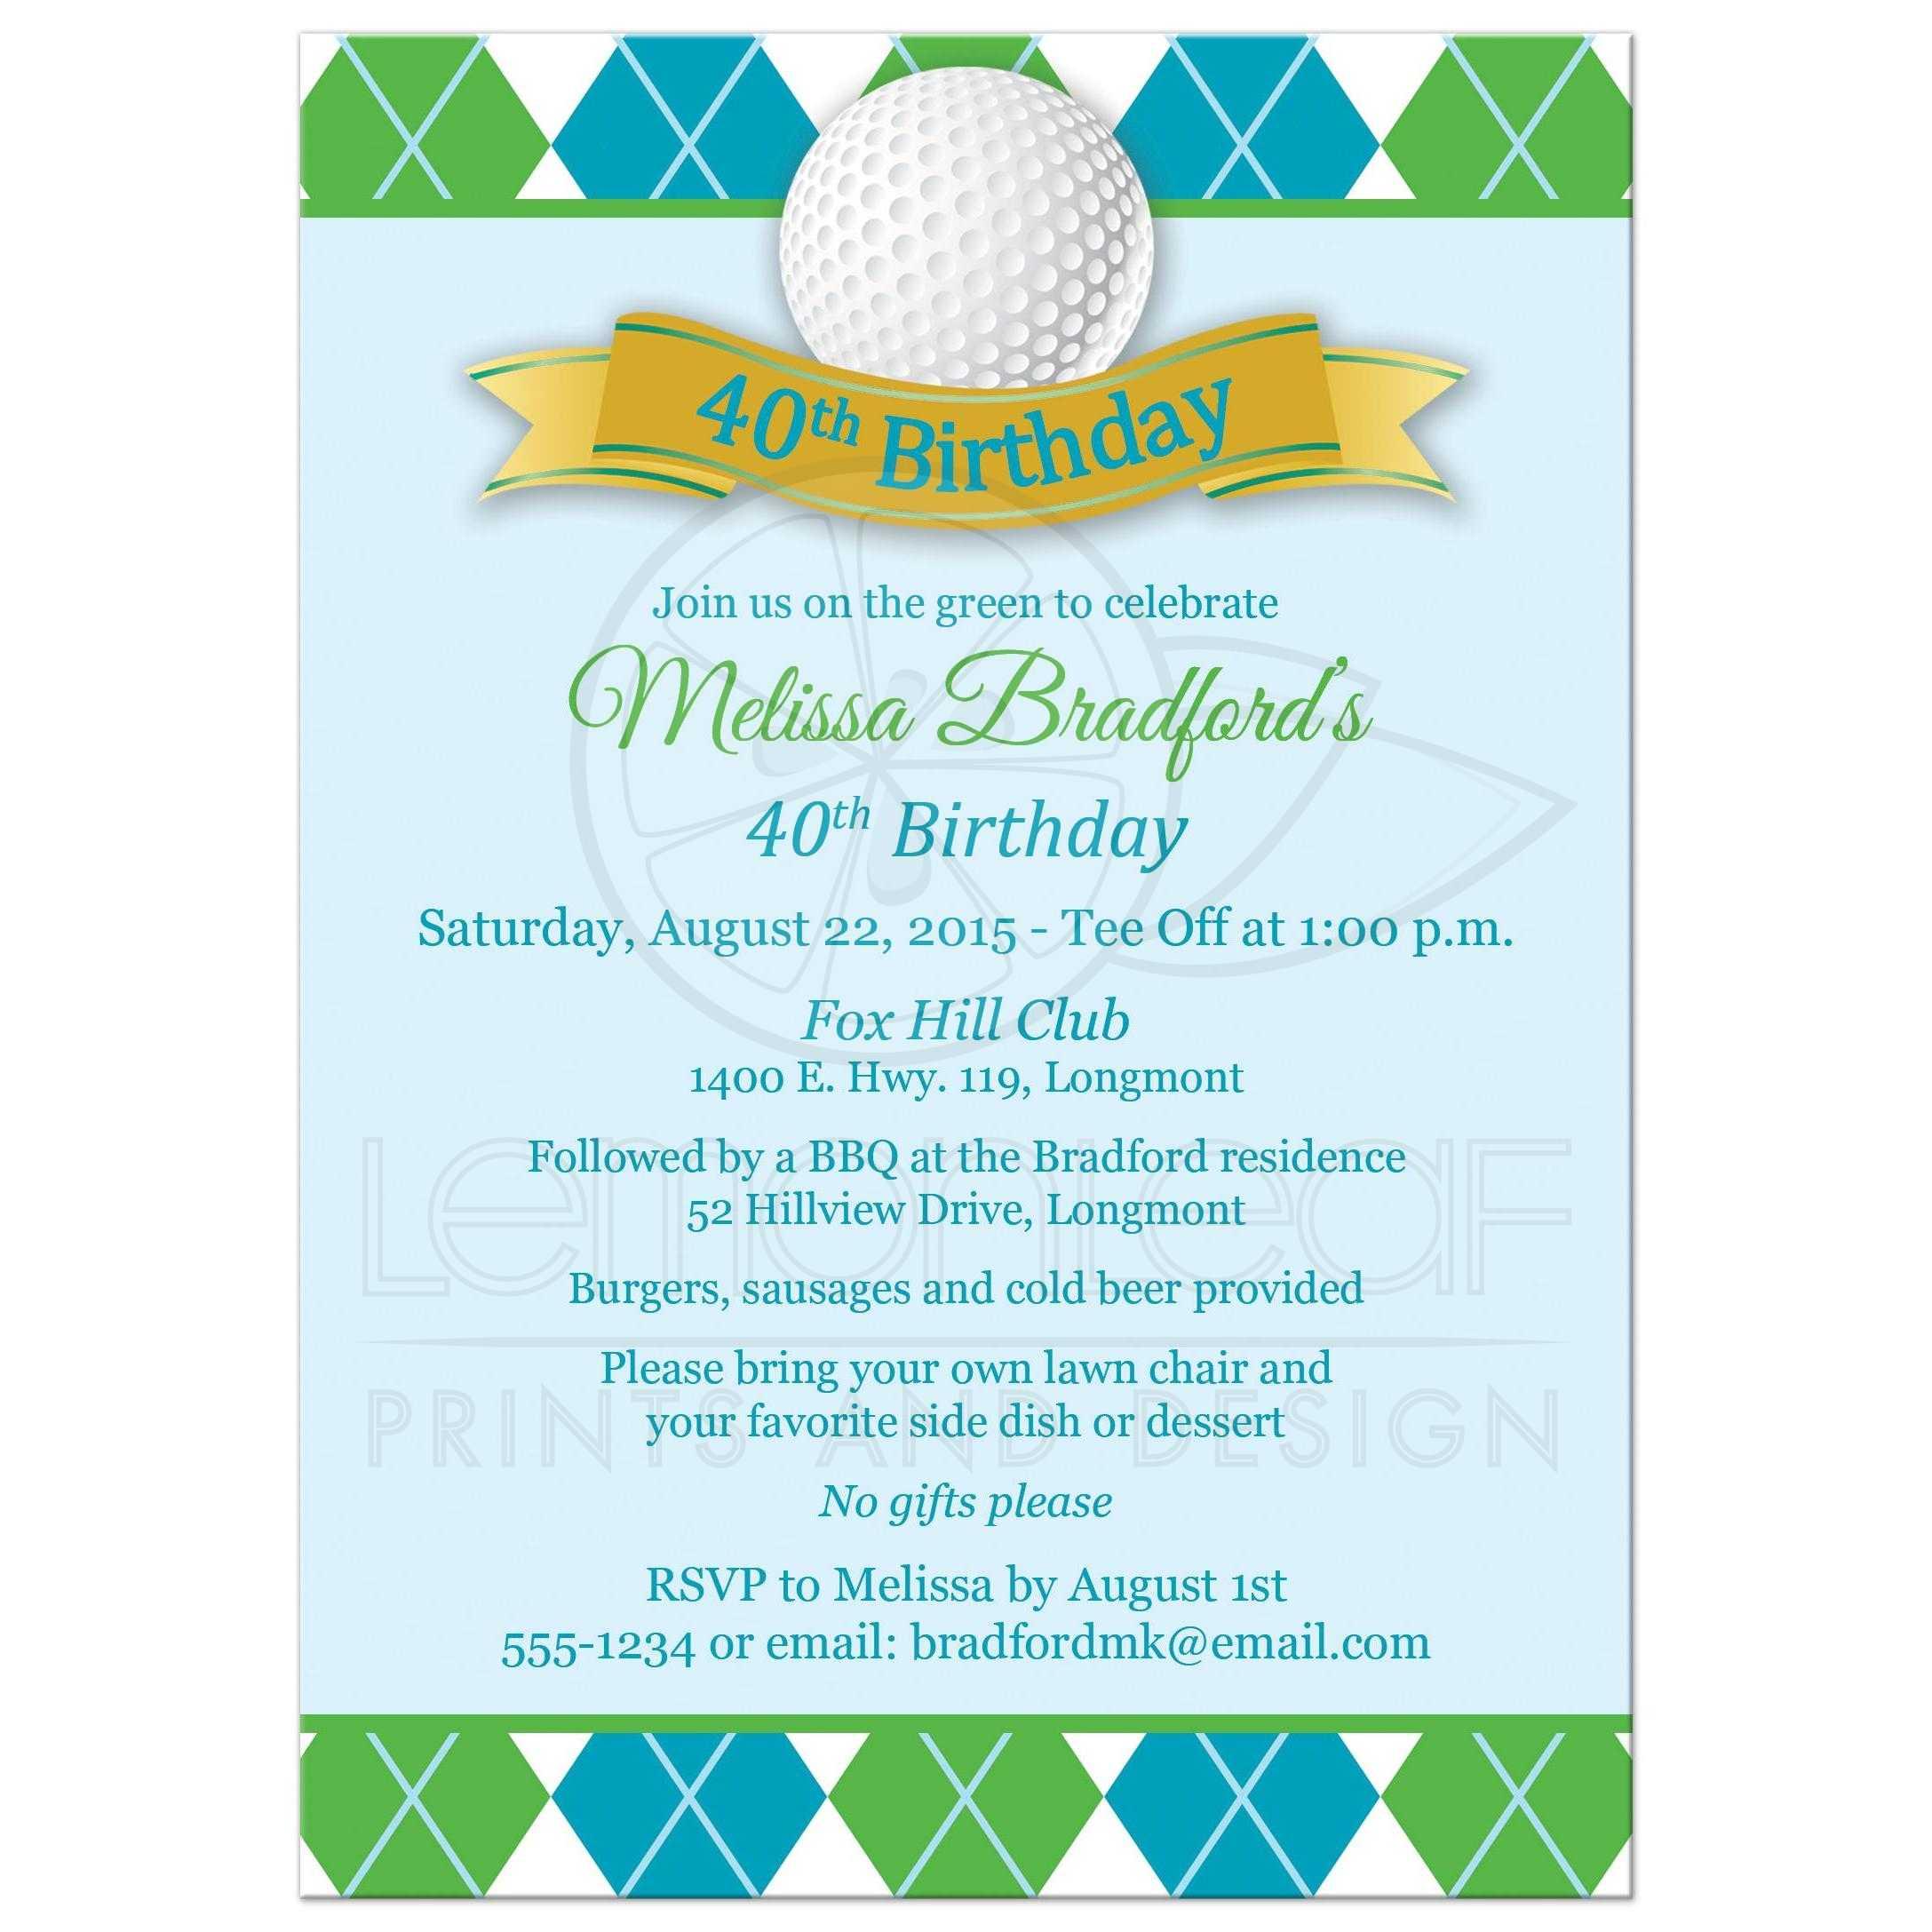 40th birthday party invitation golf theme green blue white best 40th birthday invitation for a woman golfer stopboris Choice Image